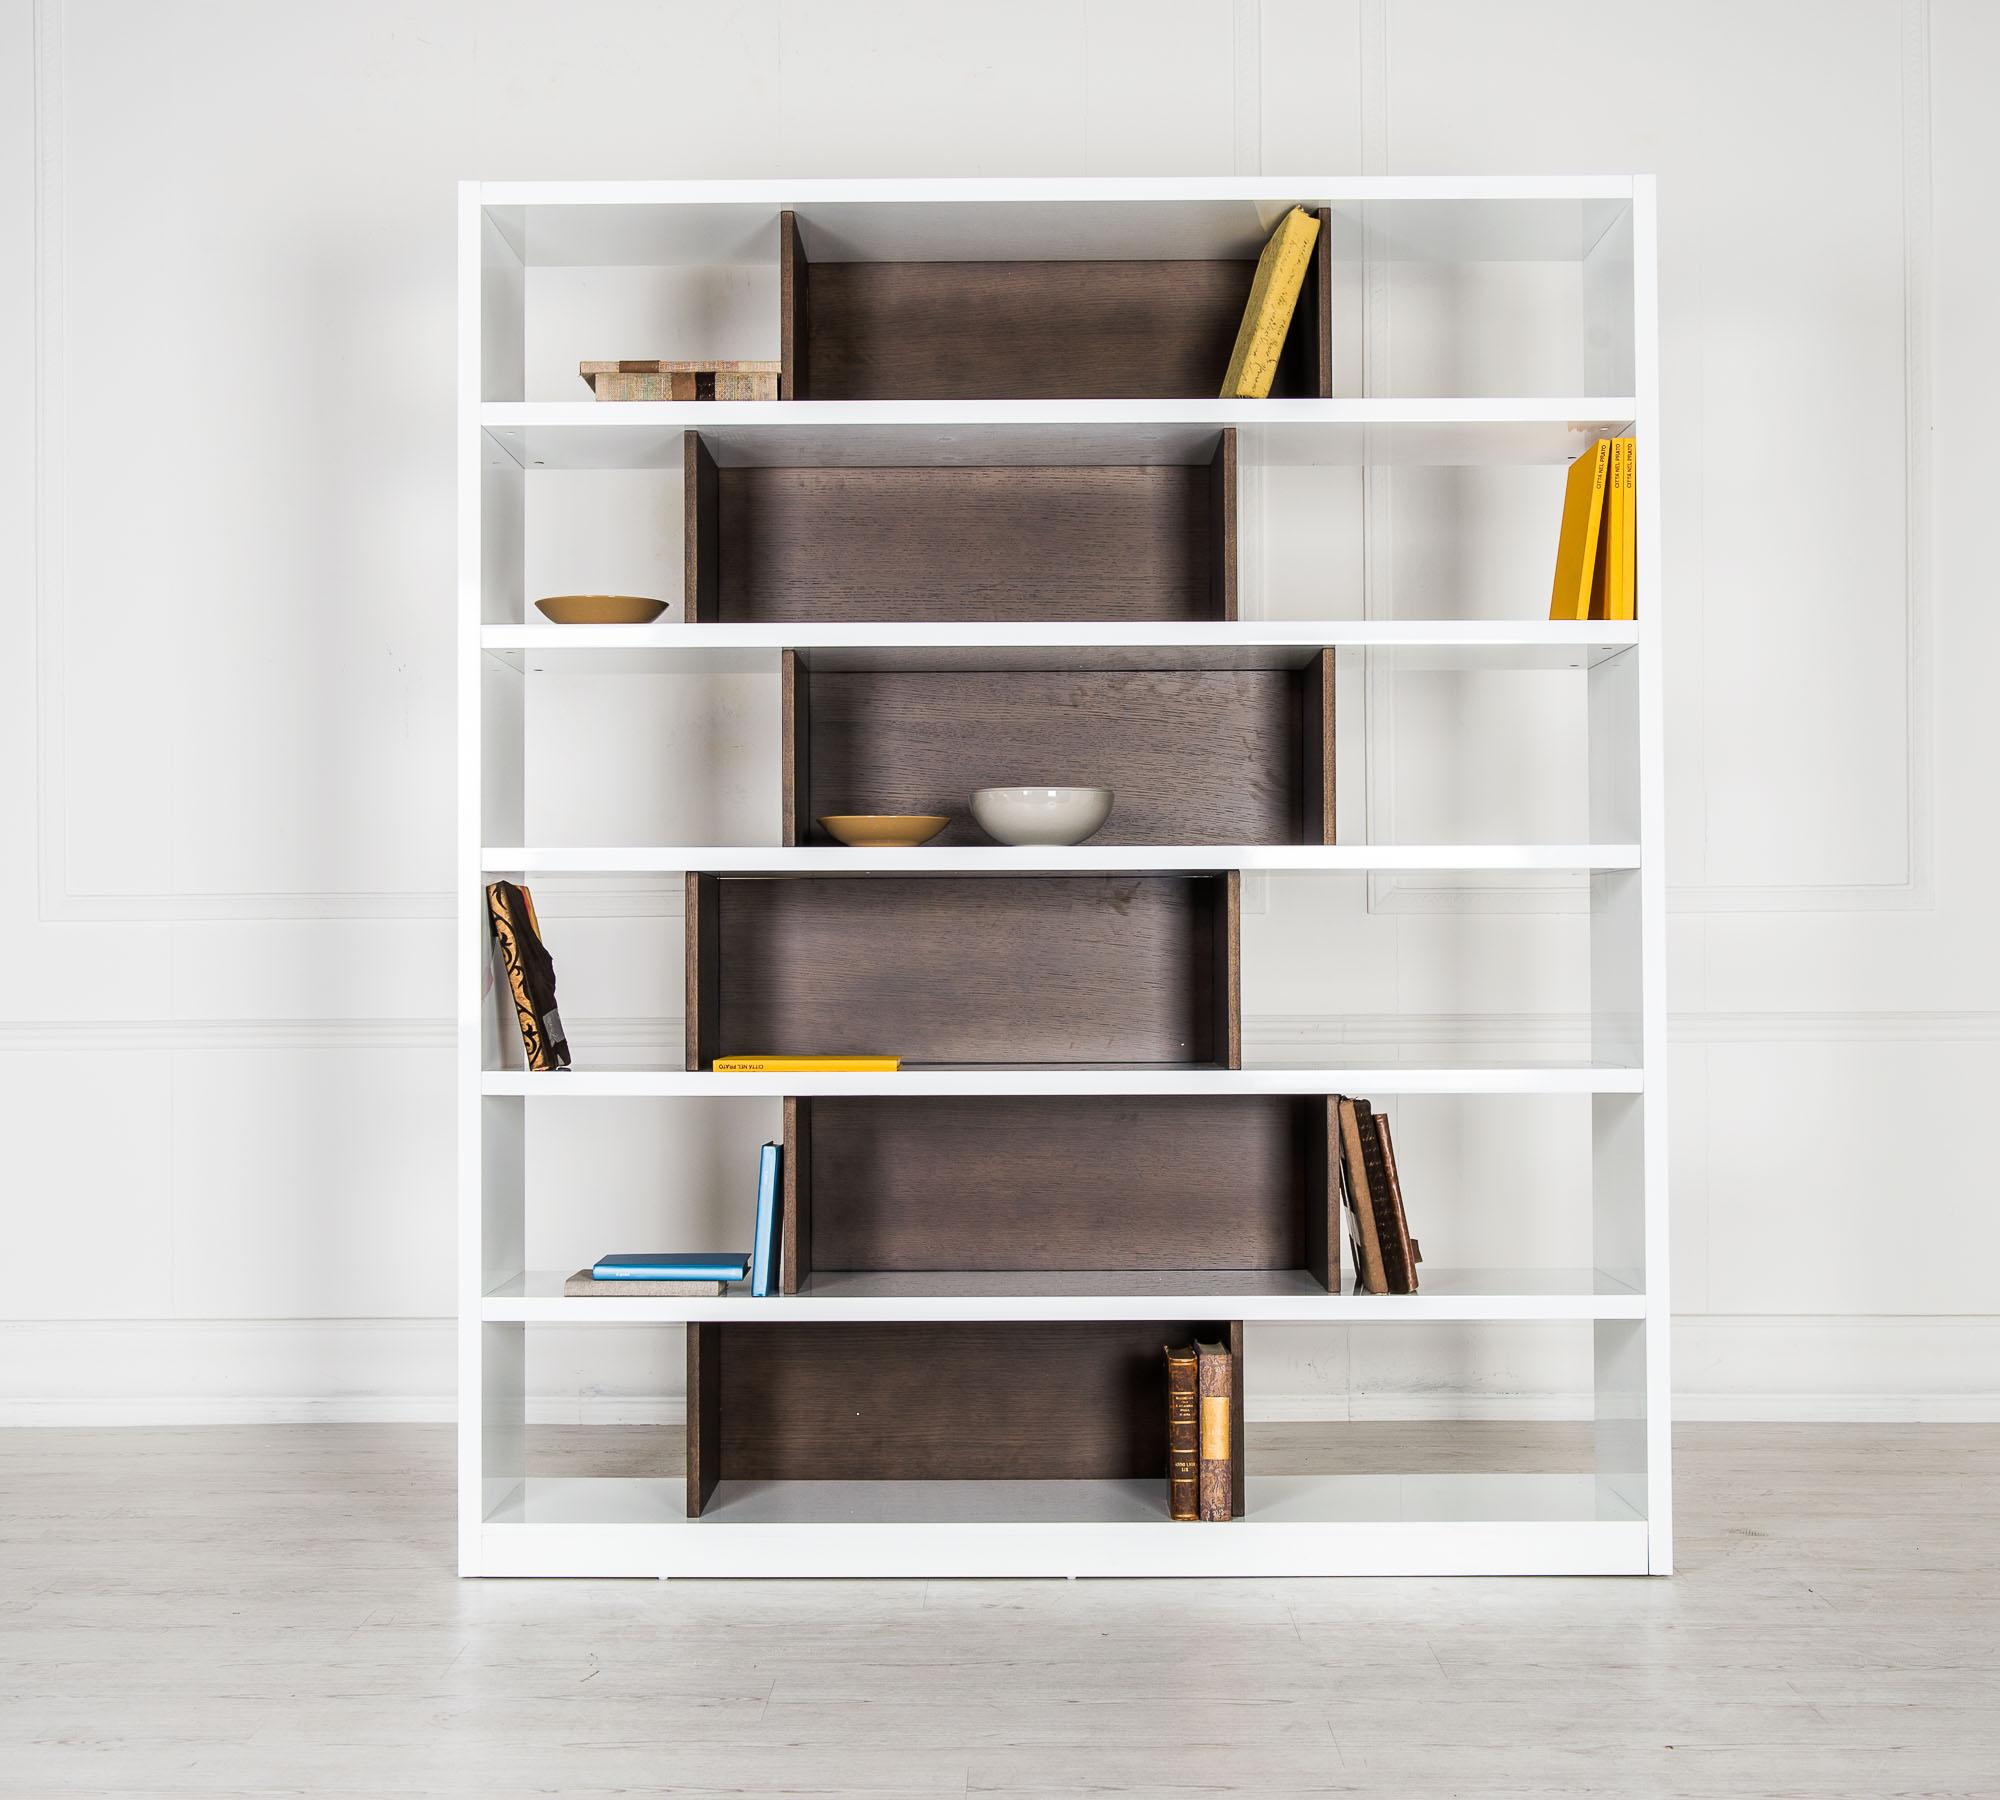 Stunning librerie a giorno contemporary acrylicgiftware for Libreria soggiorno design